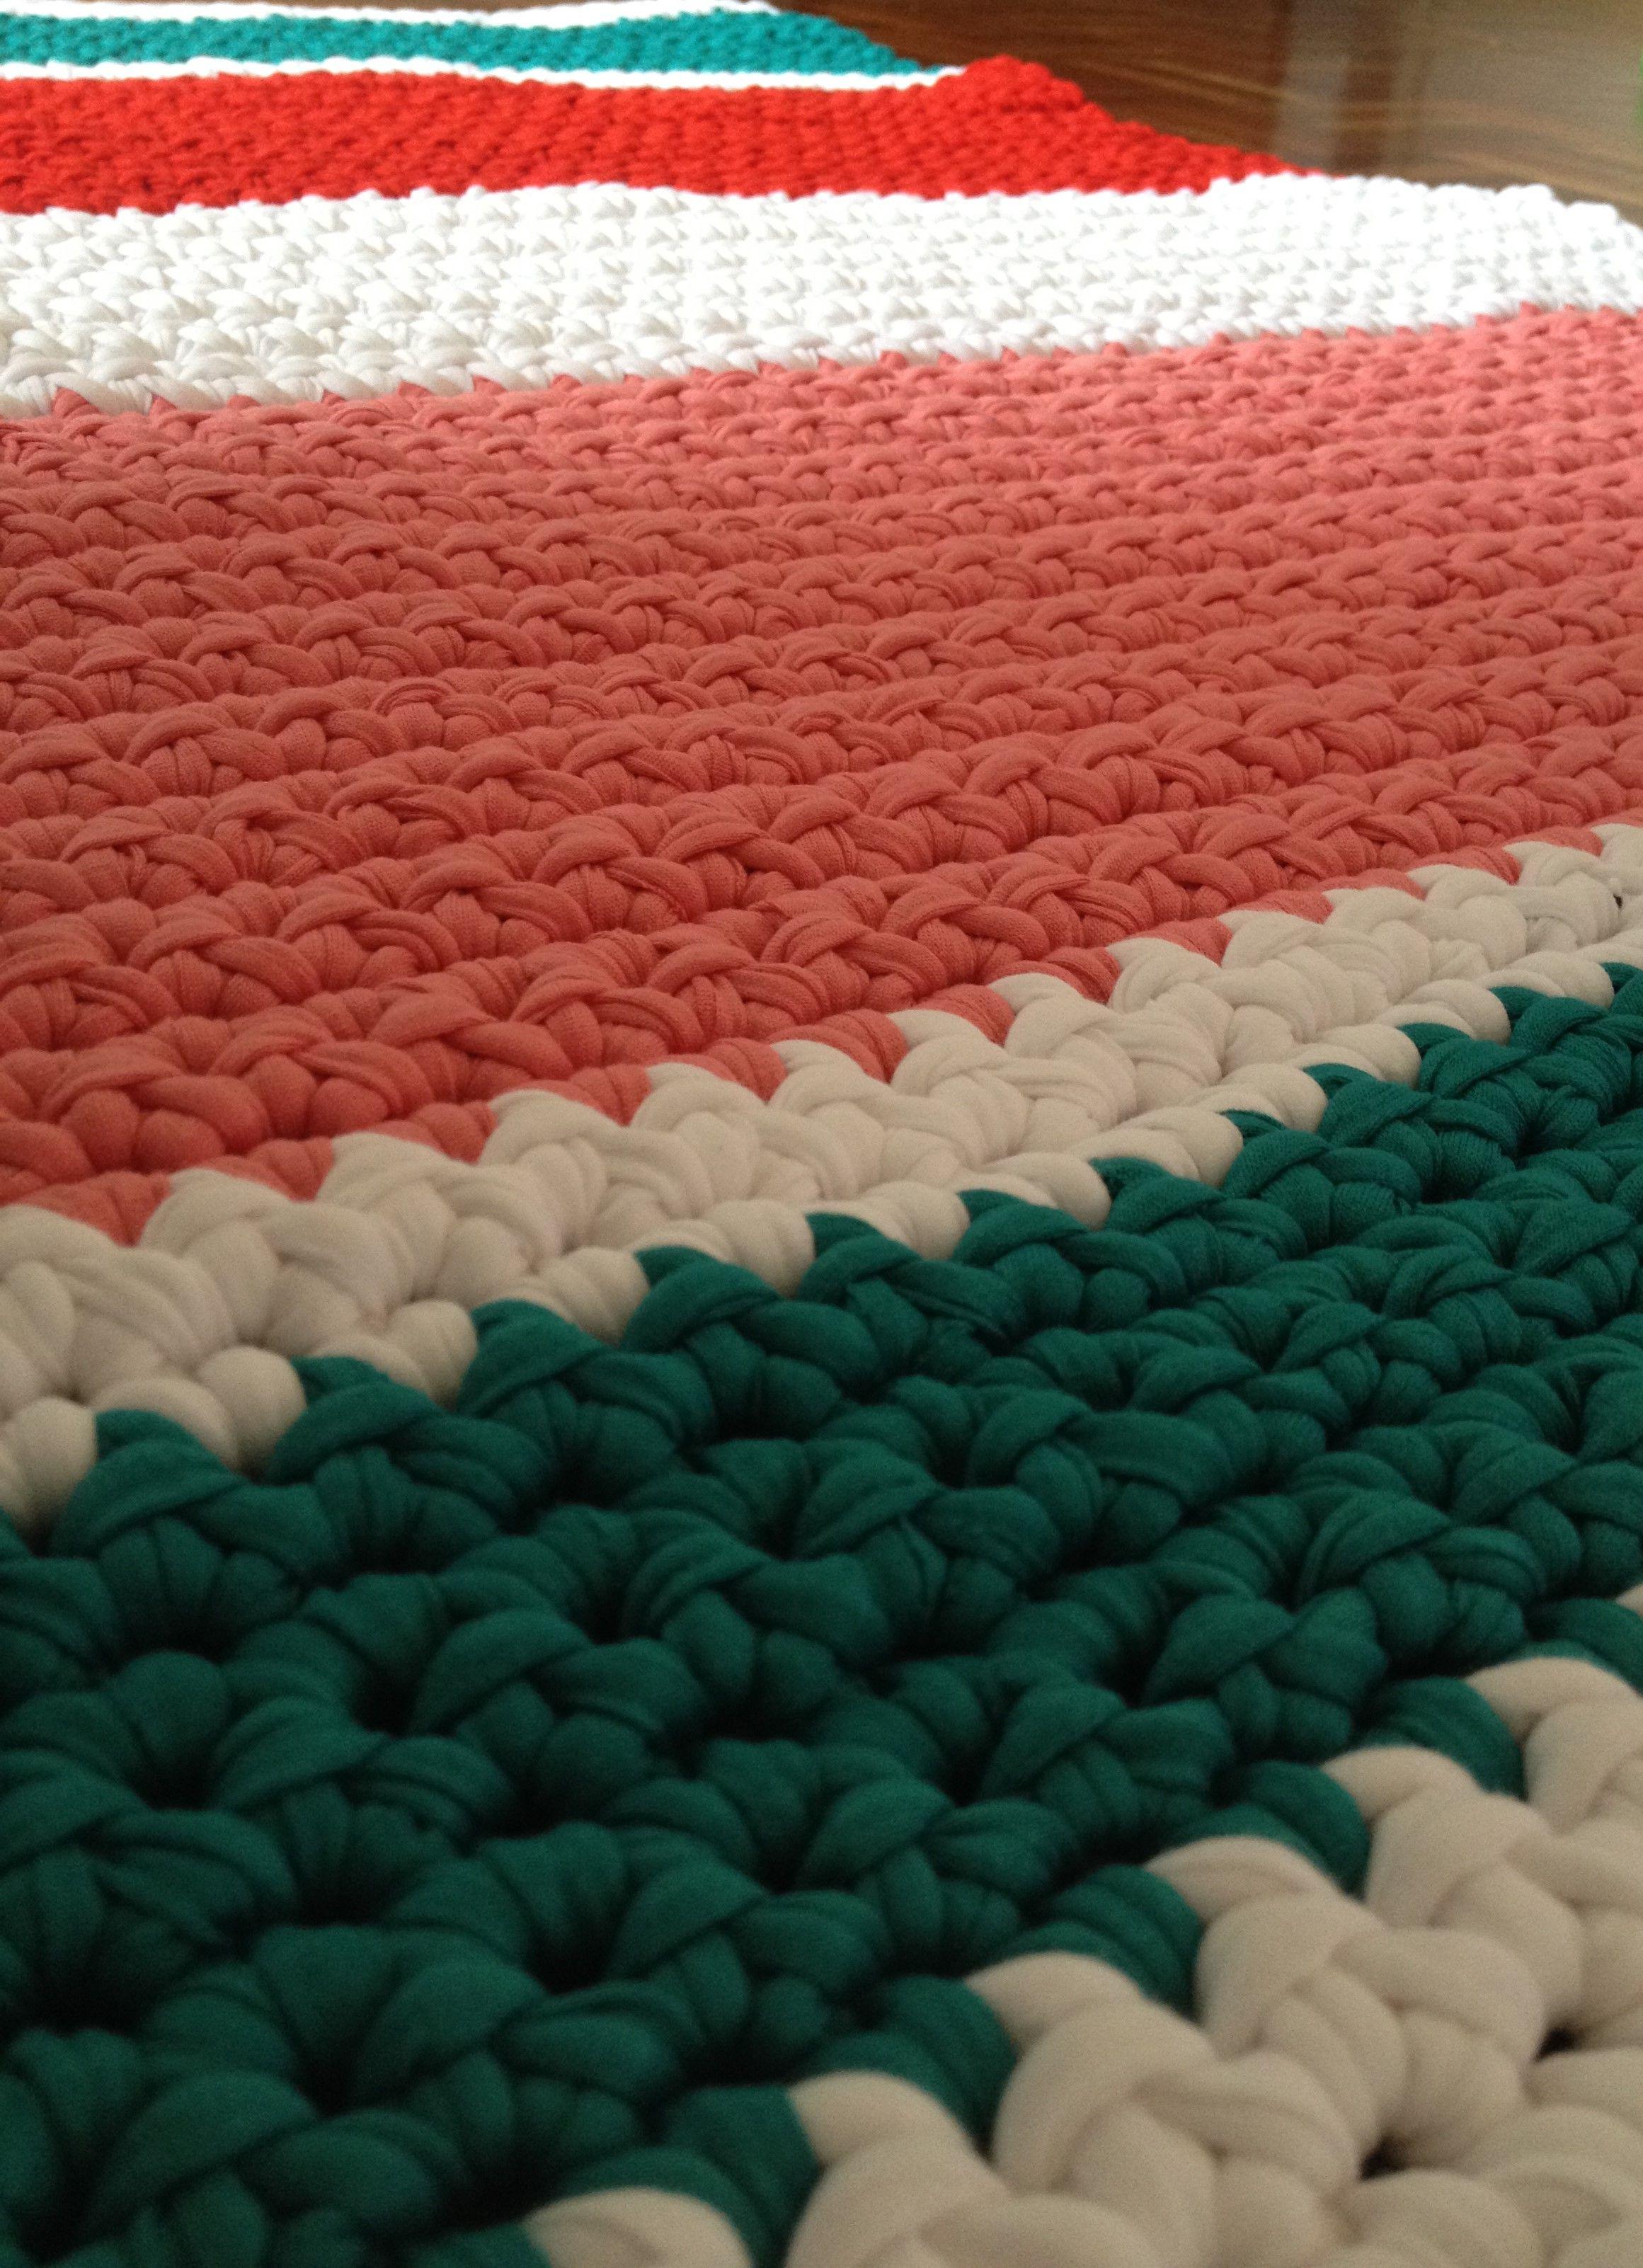 Alfombra de trapillo rectangular hecha a mano lamila lamila pinterest crochet yarns and - Alfombras a mano ...